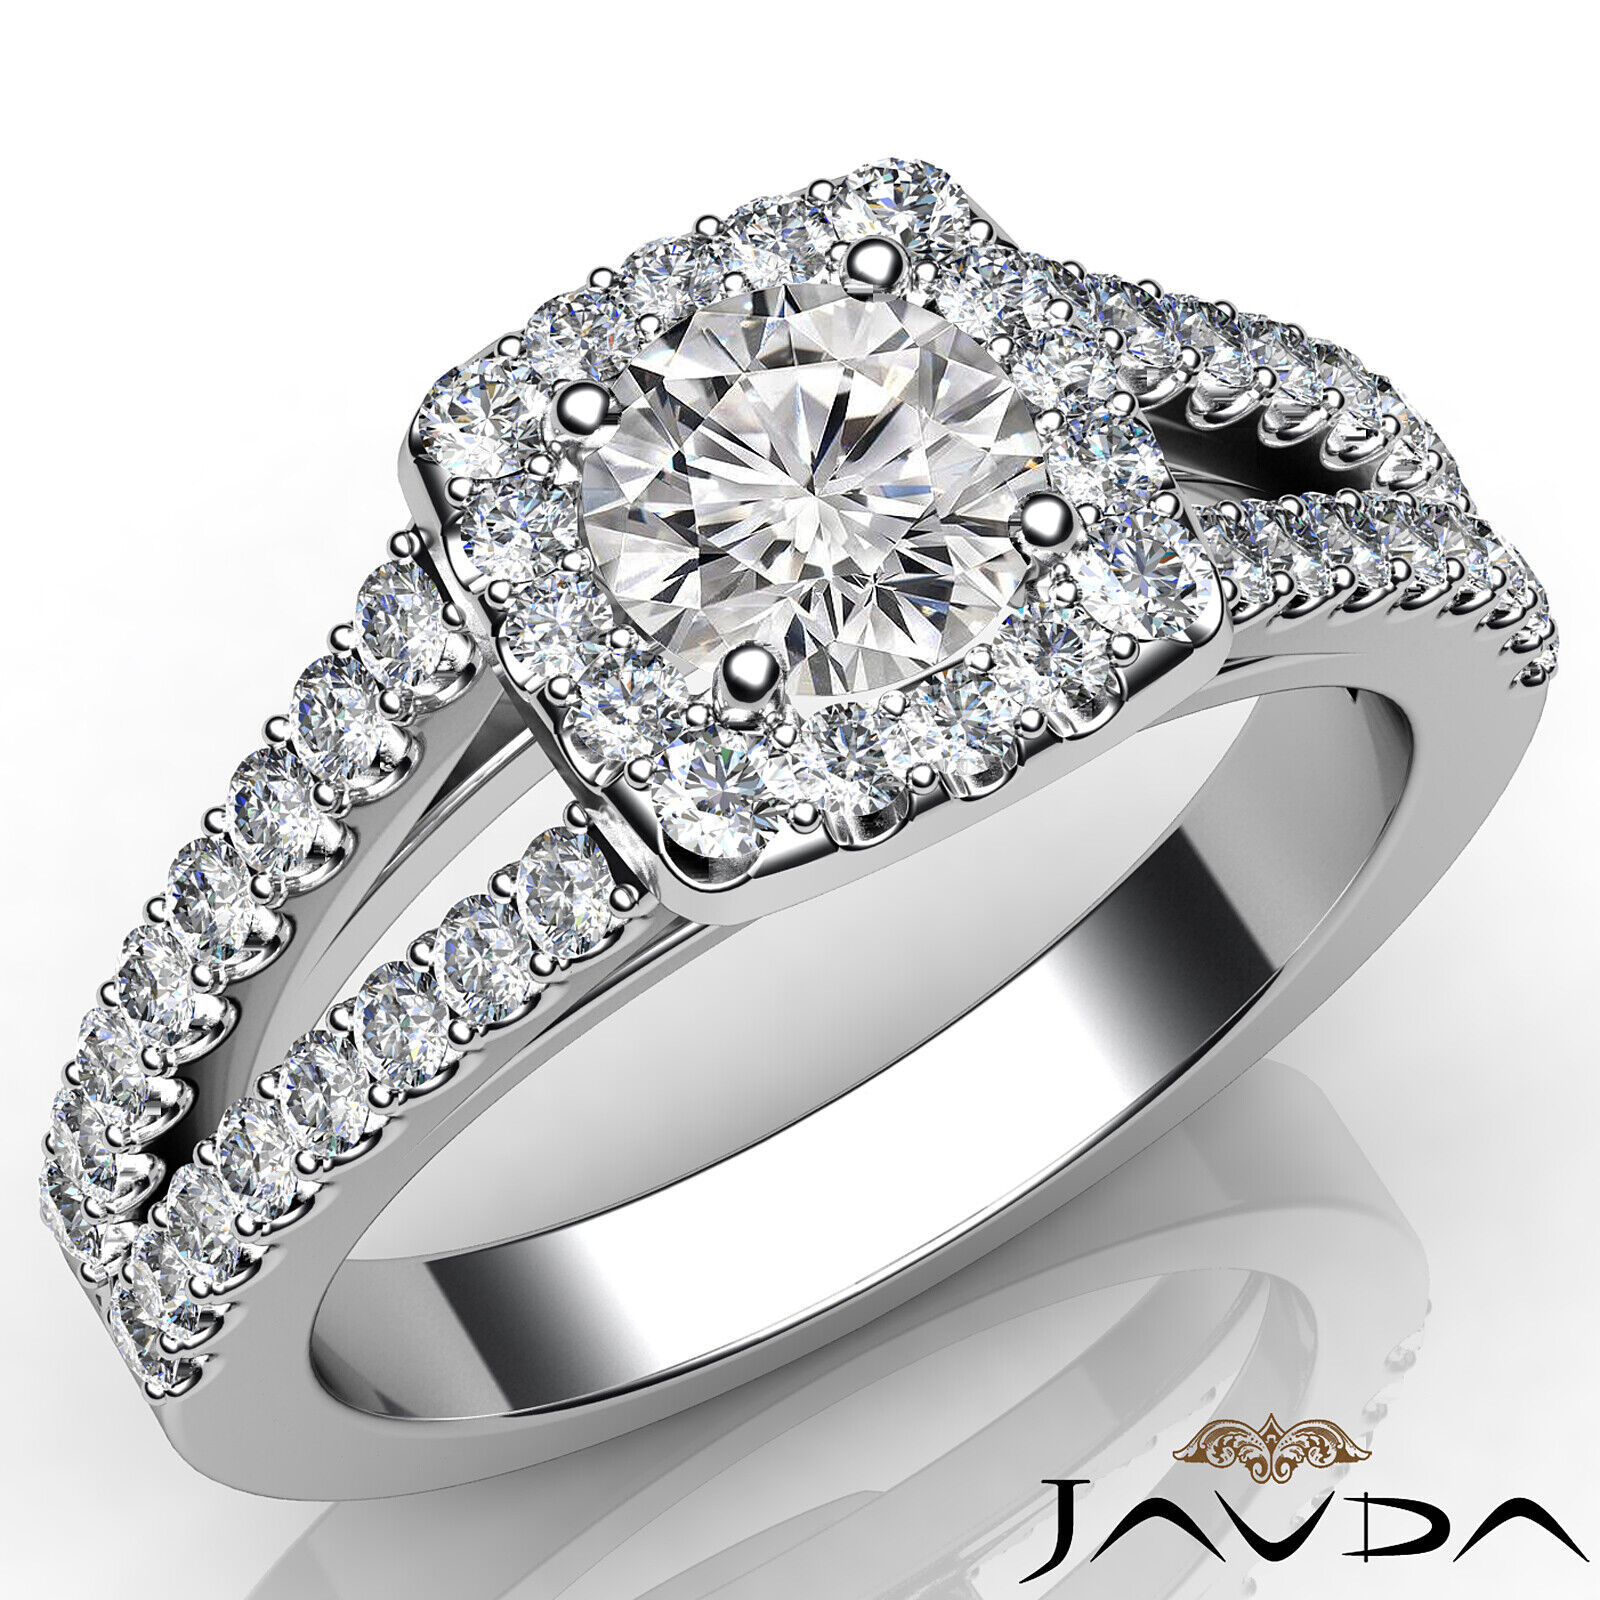 U Cut Prong Split Shank Halo Diamond Engagement Ring U Pave Set GIA SI1 1 1/4Ct